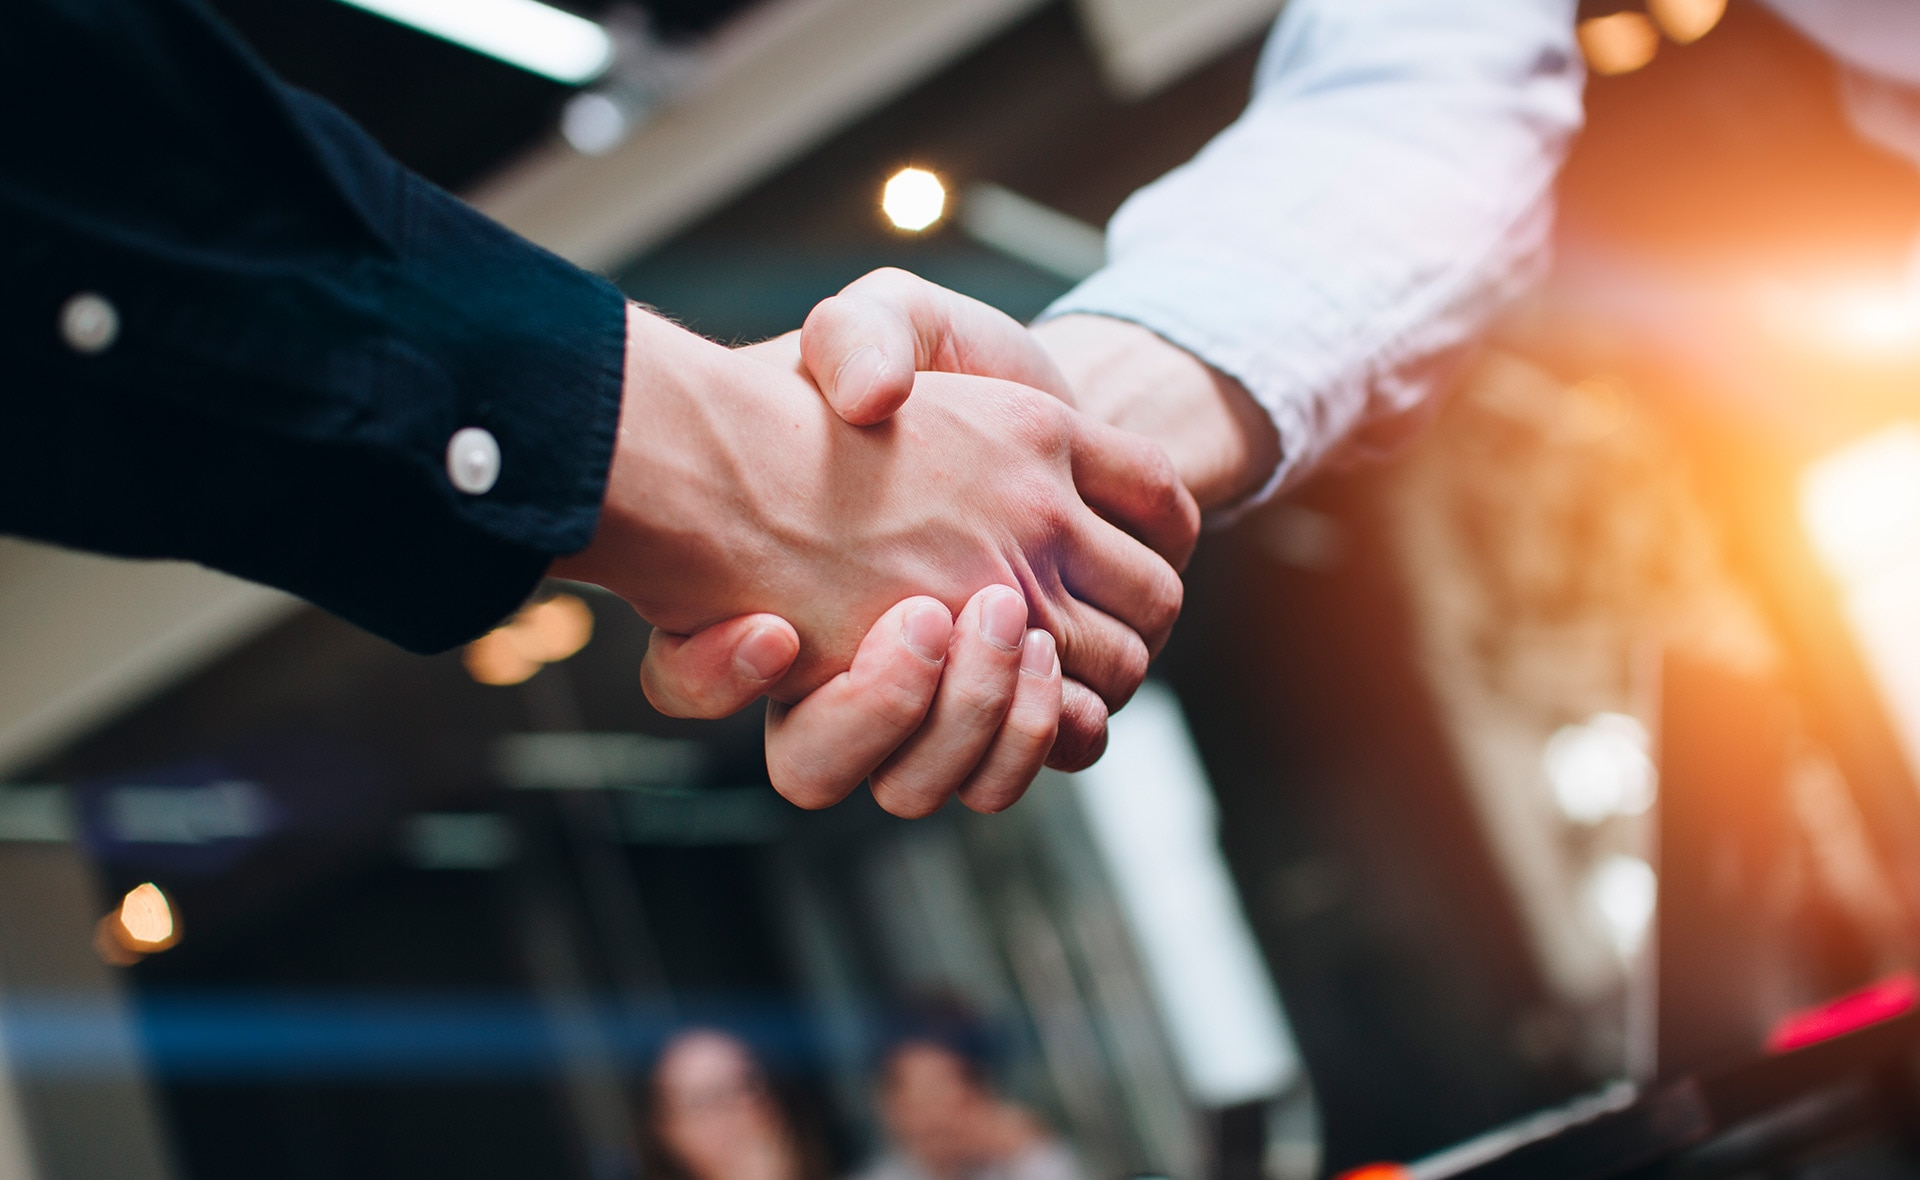 BBVA-podcast_fondos_europeos-acuerdo-trato-equipo-empresas-pymes-colaboracion